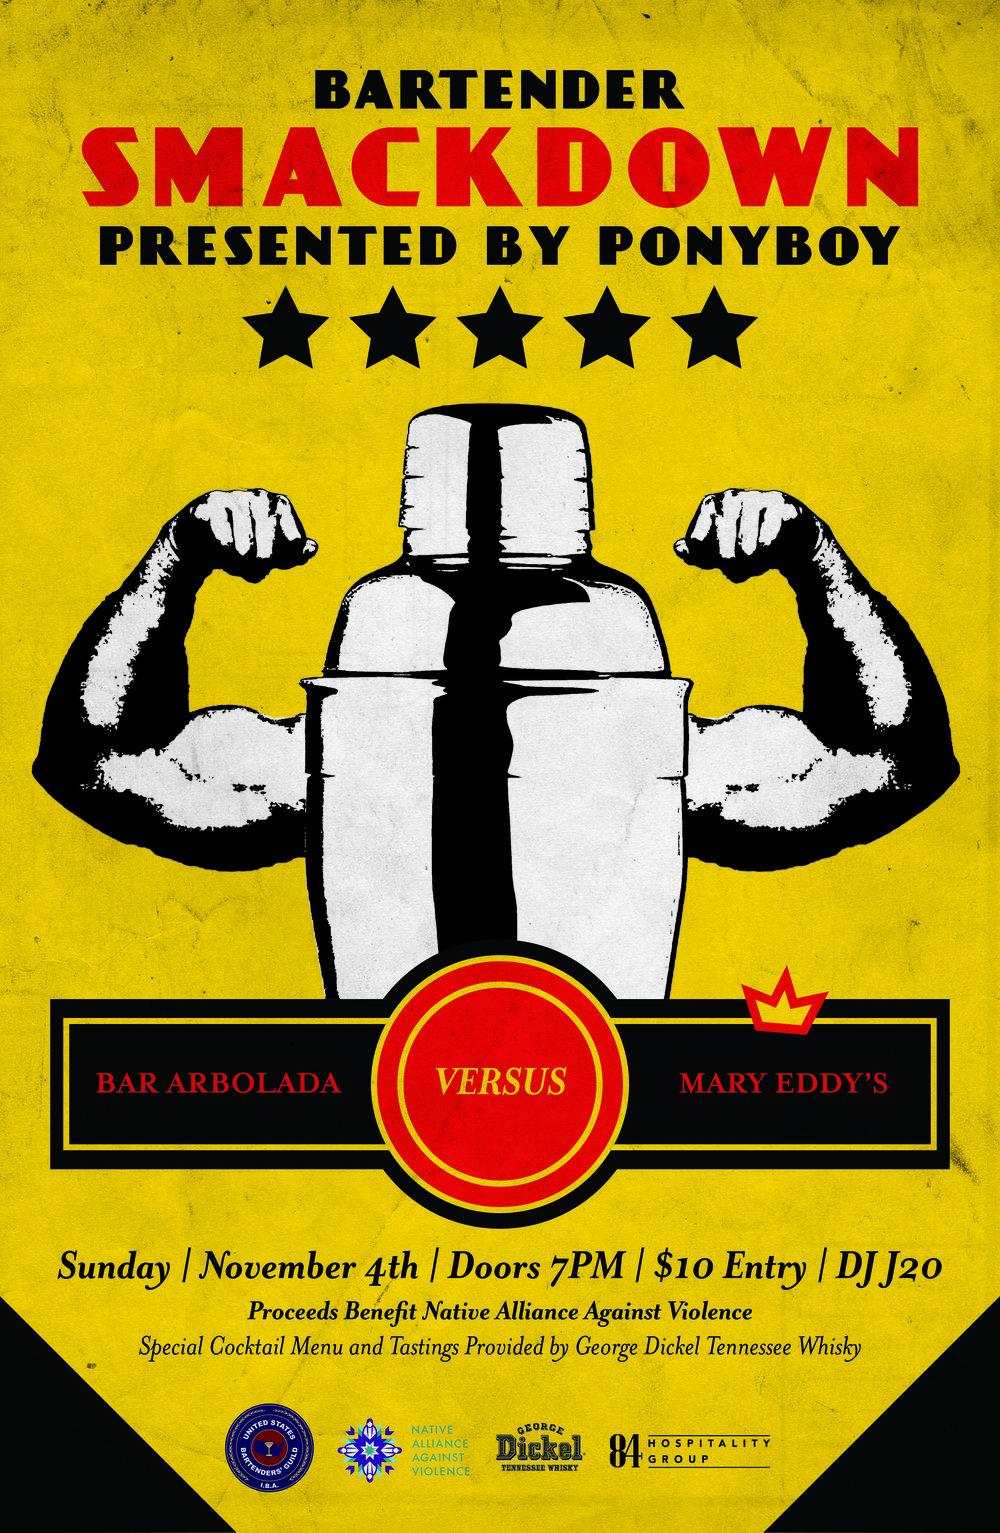 Ponyboy Smackdown Poster-05.jpg